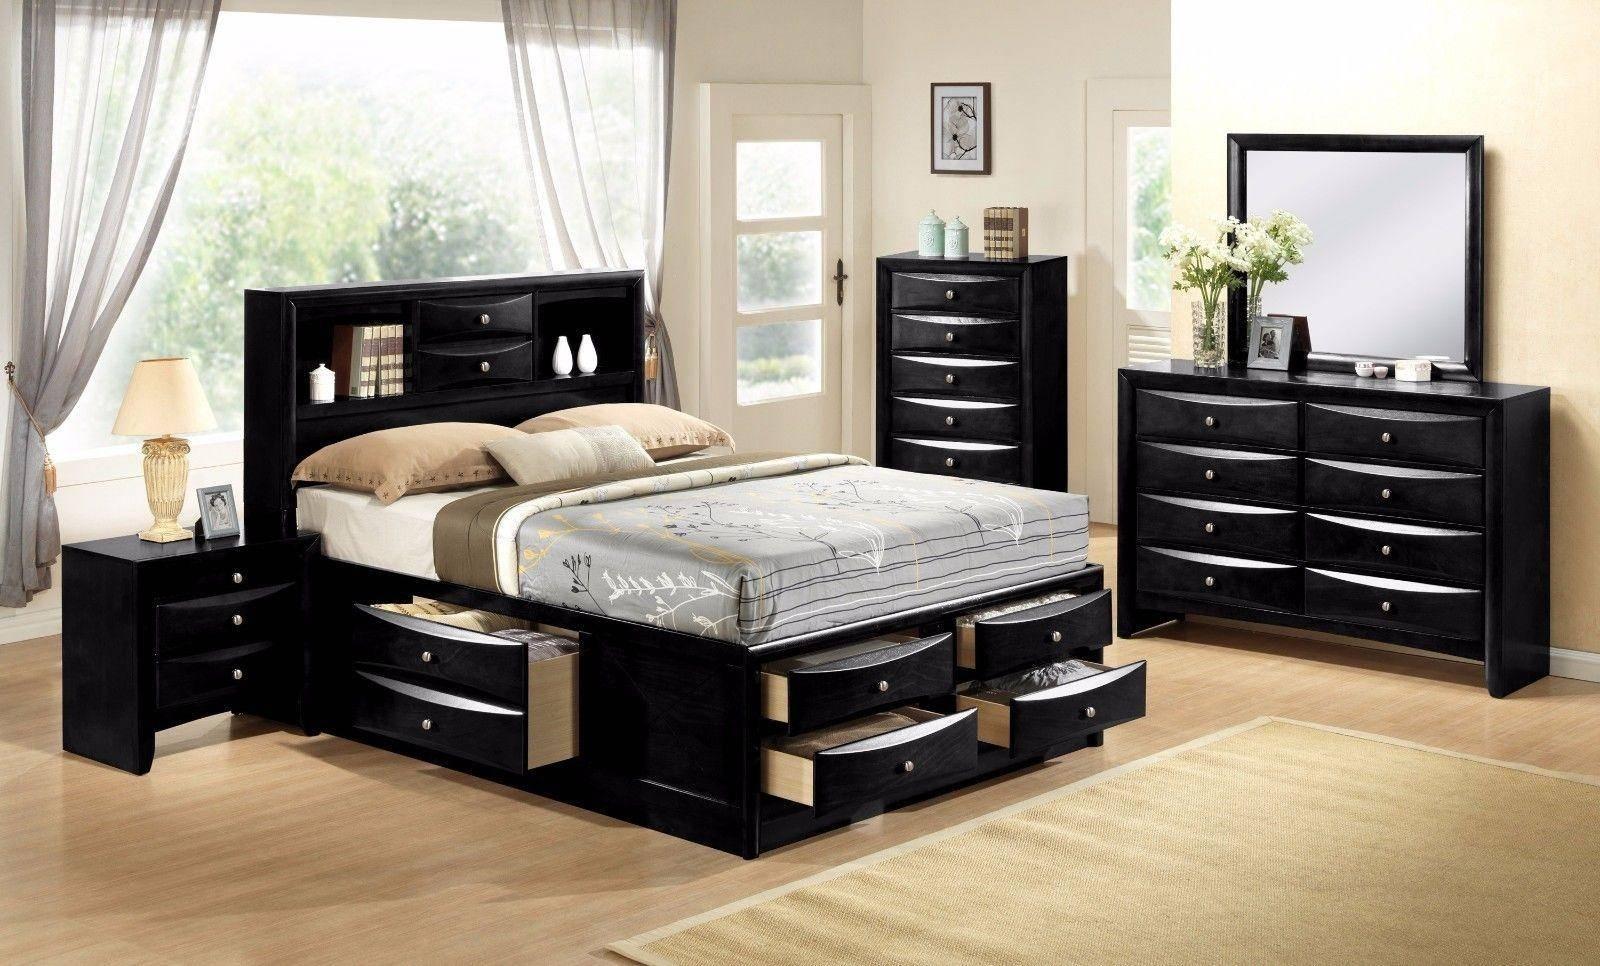 Buy Crown Mark B4285 Emily King Storage Bedroom Set 5 Pcs In Black Faux Leather Online